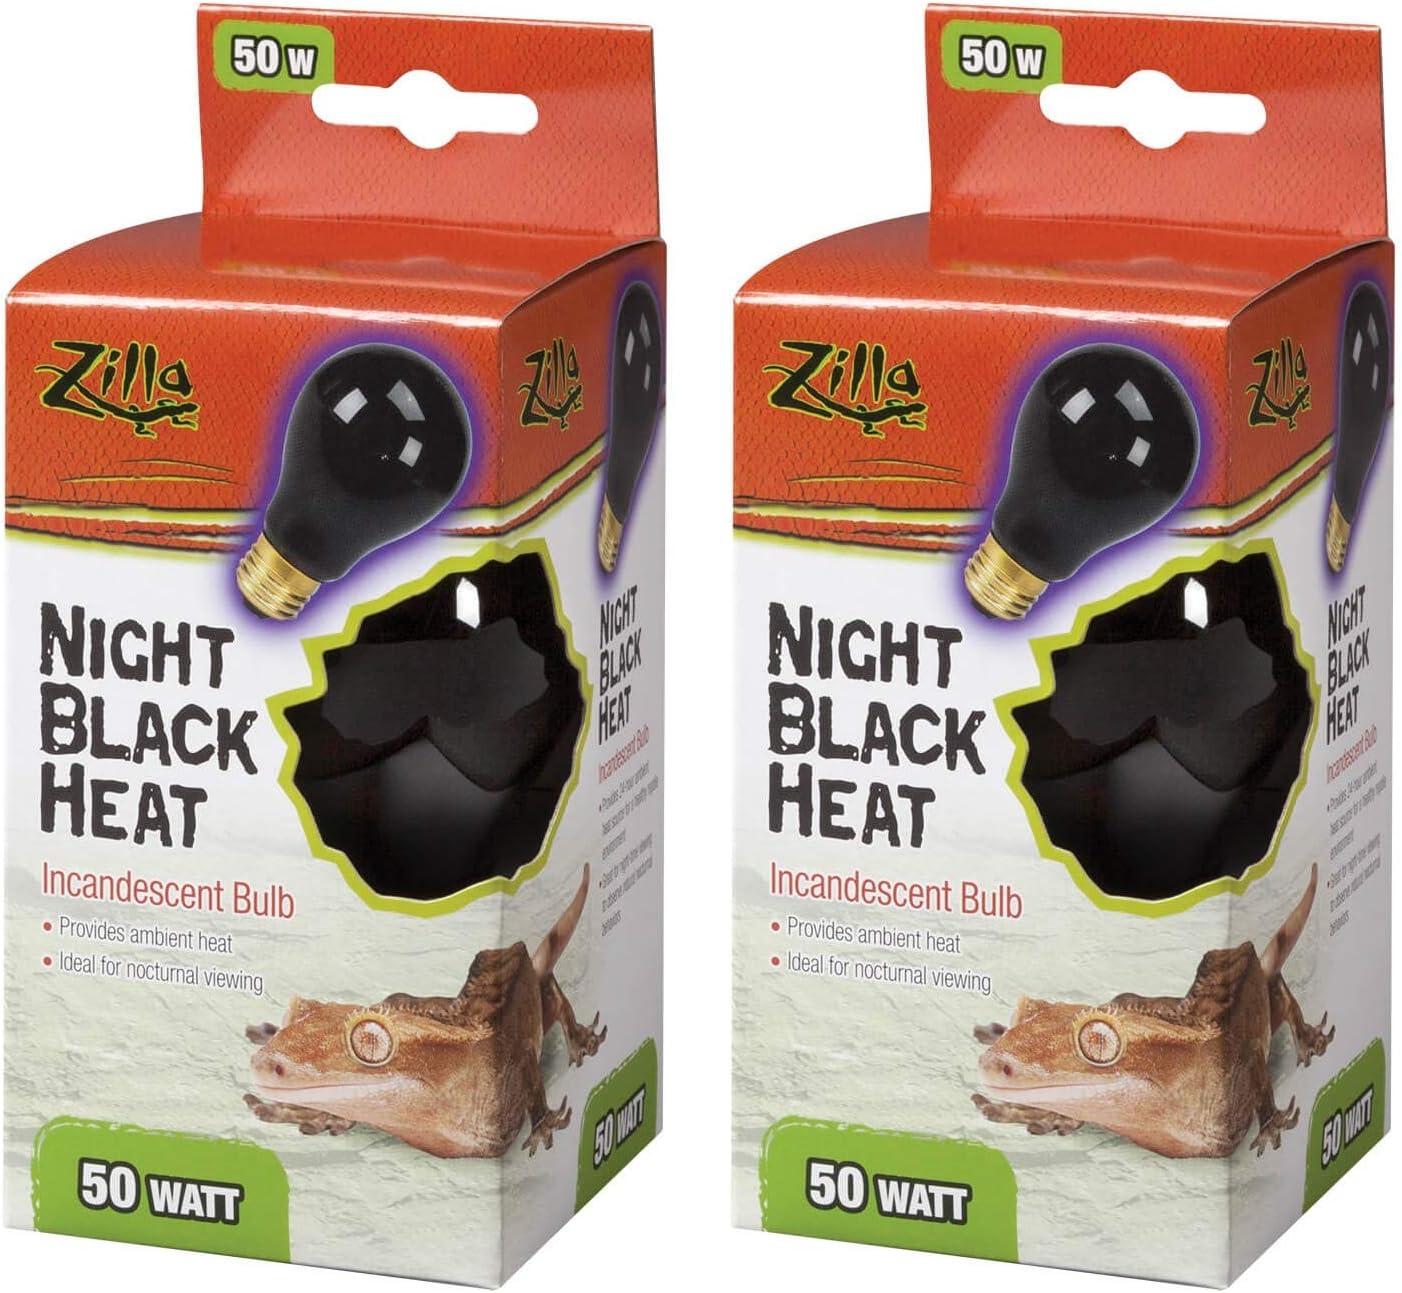 Zilla Night Black Heat Incandescent Bulb for Reptiles [Set of 2] Watt: 50 Watts